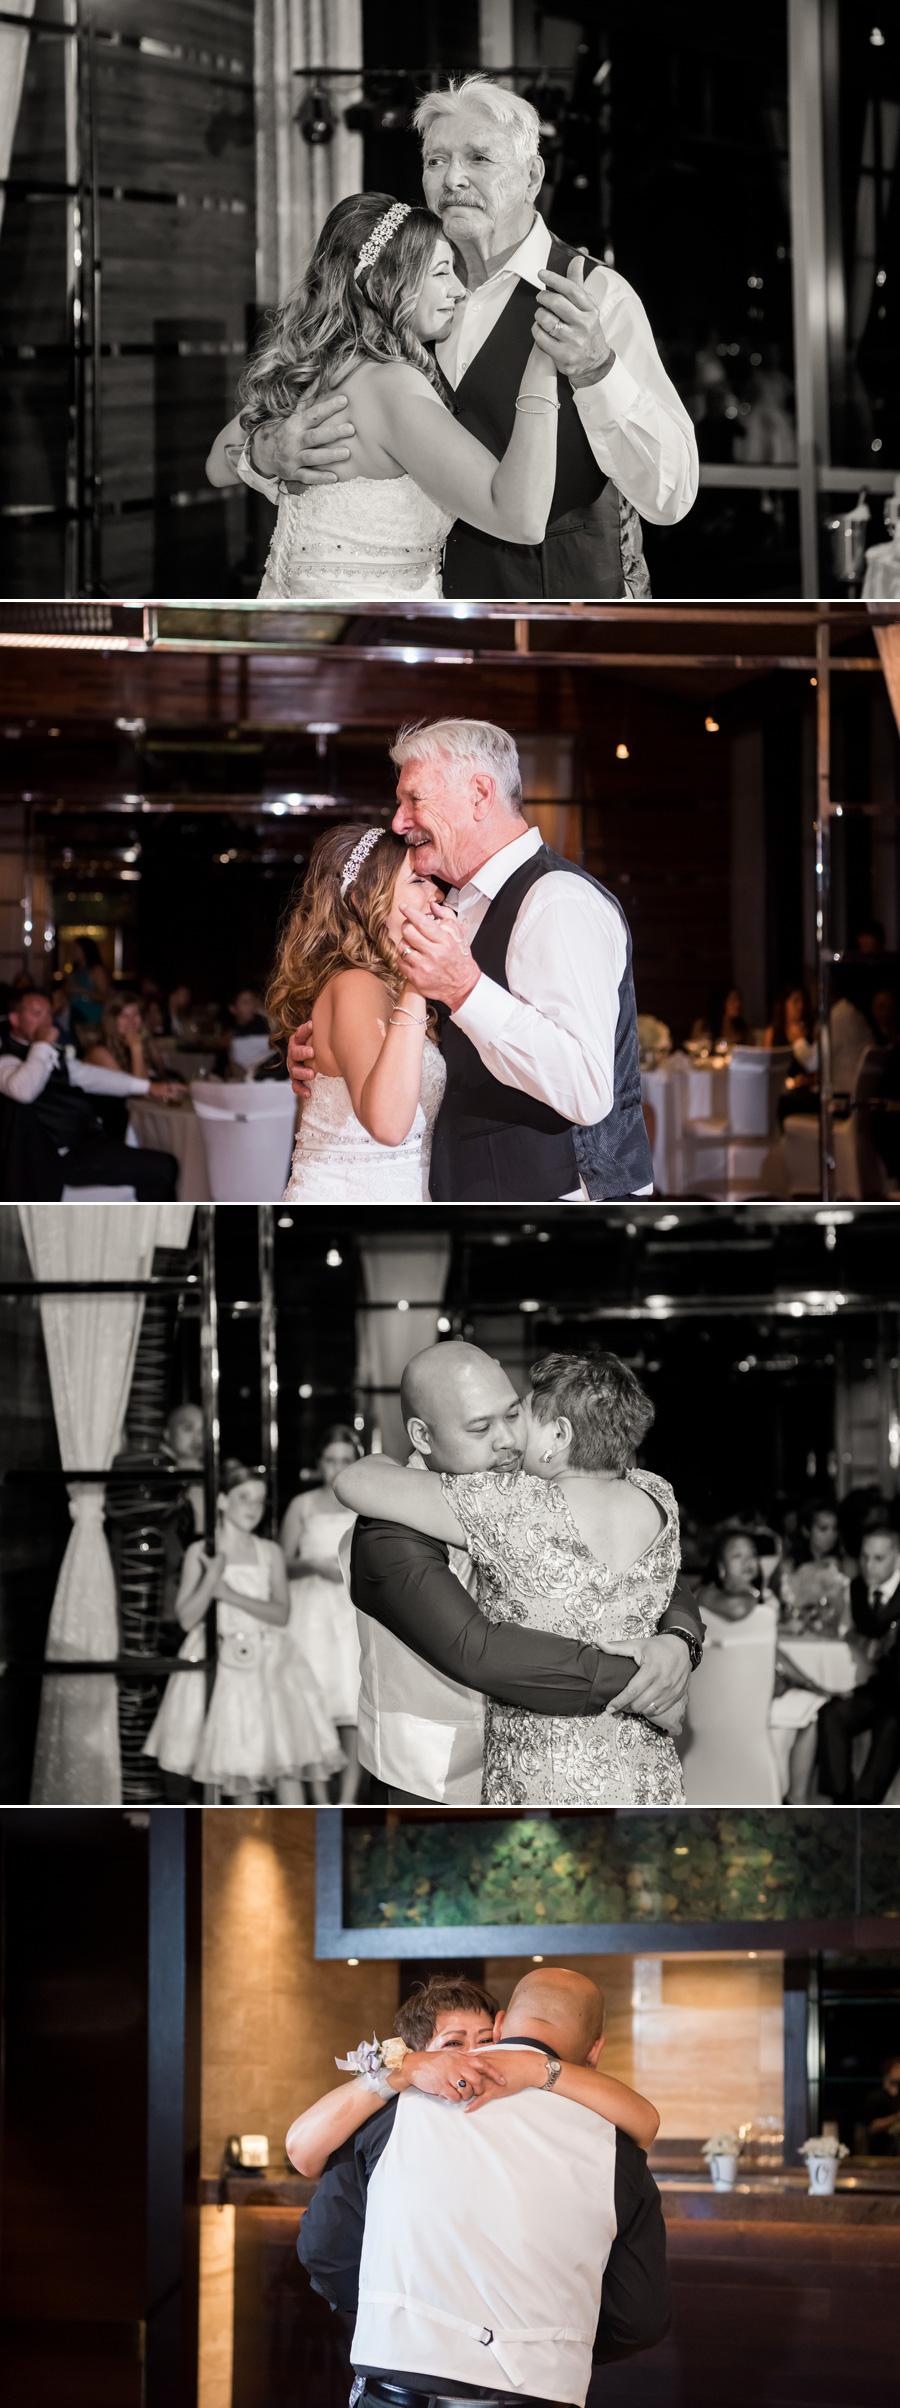 M Resort Las Vegas Destination Wedding | KMH Photography | Las Vegas Wedding Photography